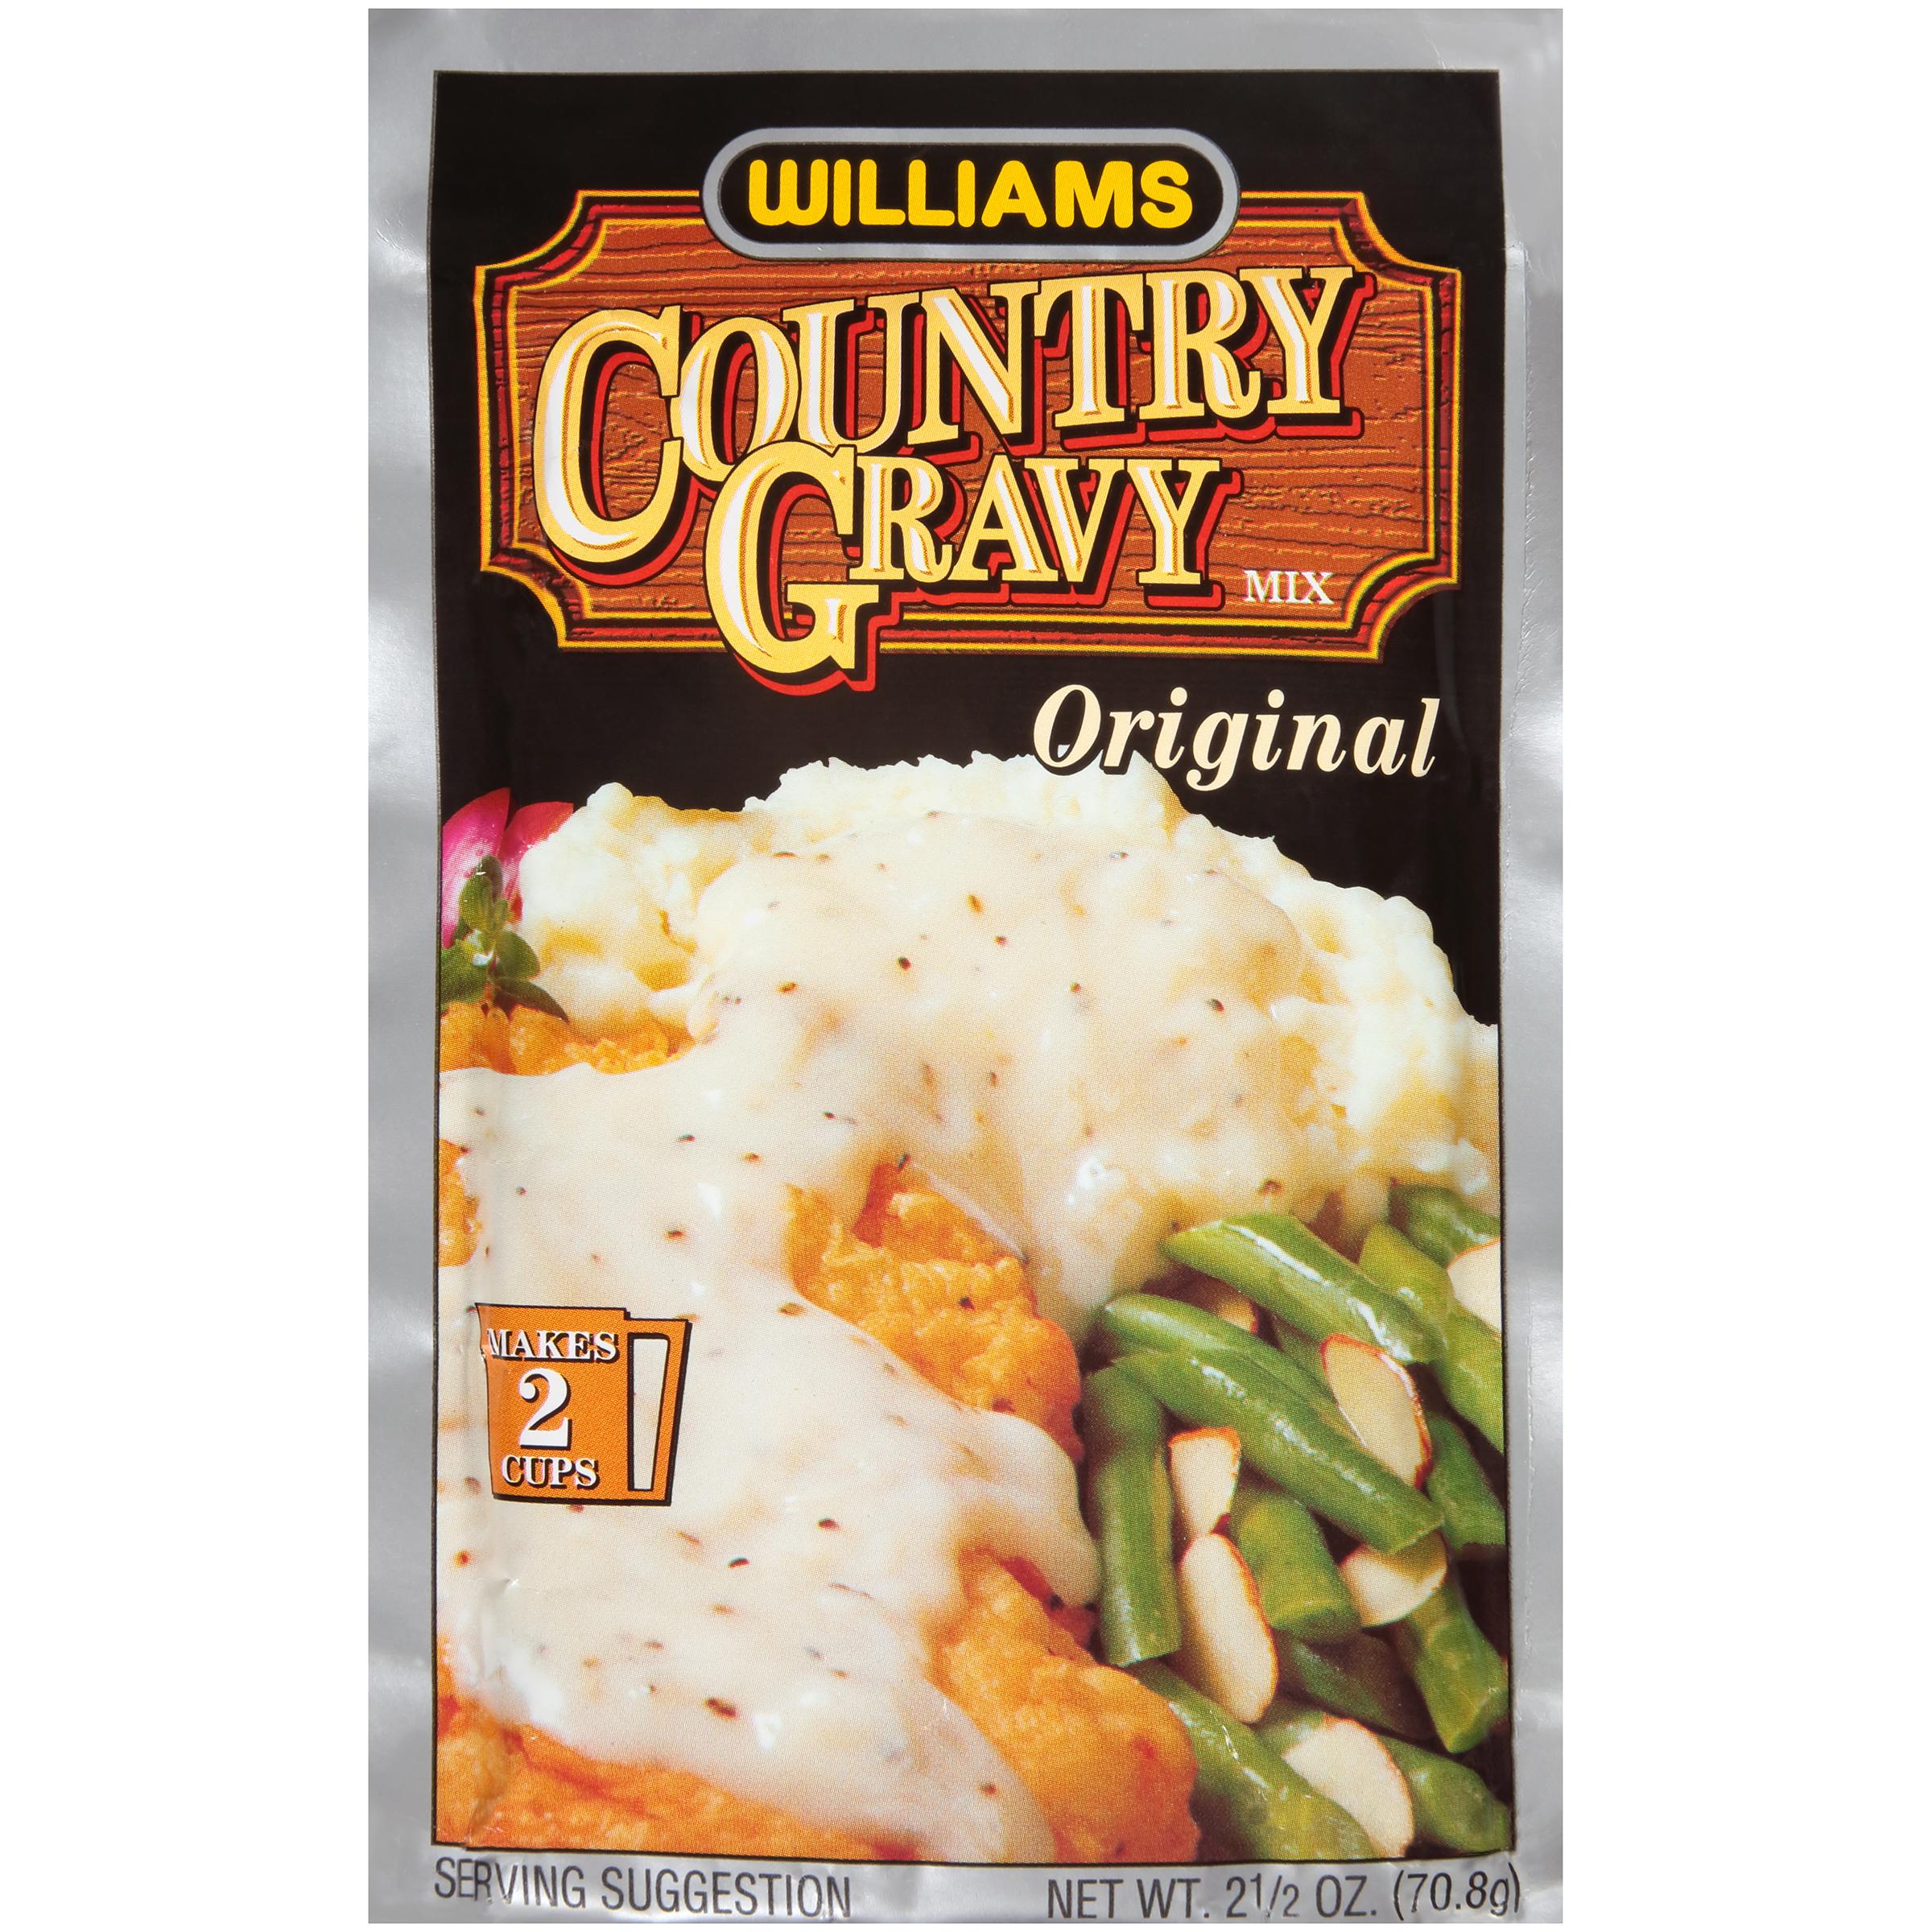 Country Gravy Mix, Original, 2.5 oz (70.8 g) PartNumber: 08748882000P